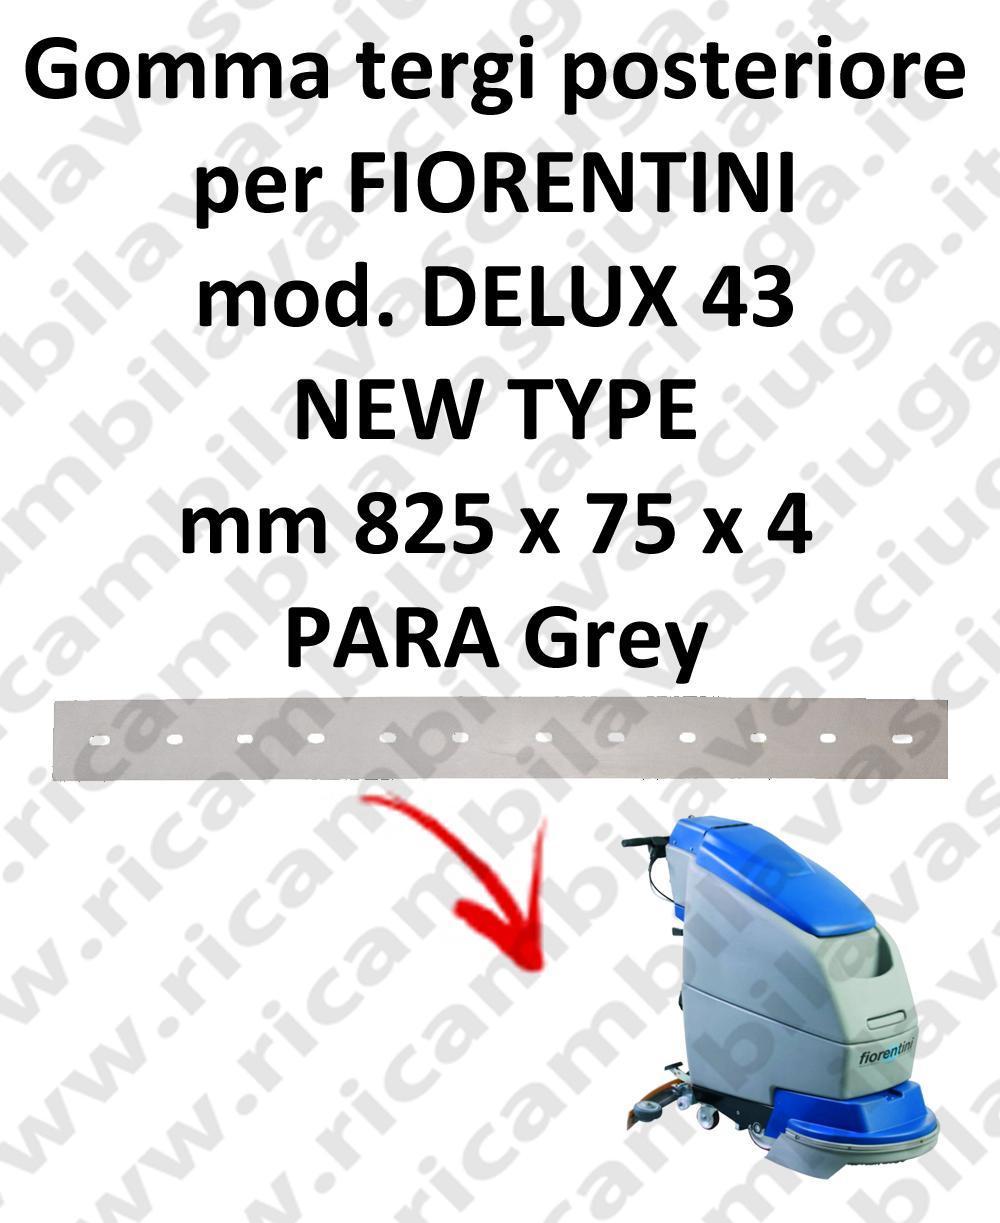 DELUX 43 new type BAVETTE ARRIERE pour autolaveuses FIORENTINI